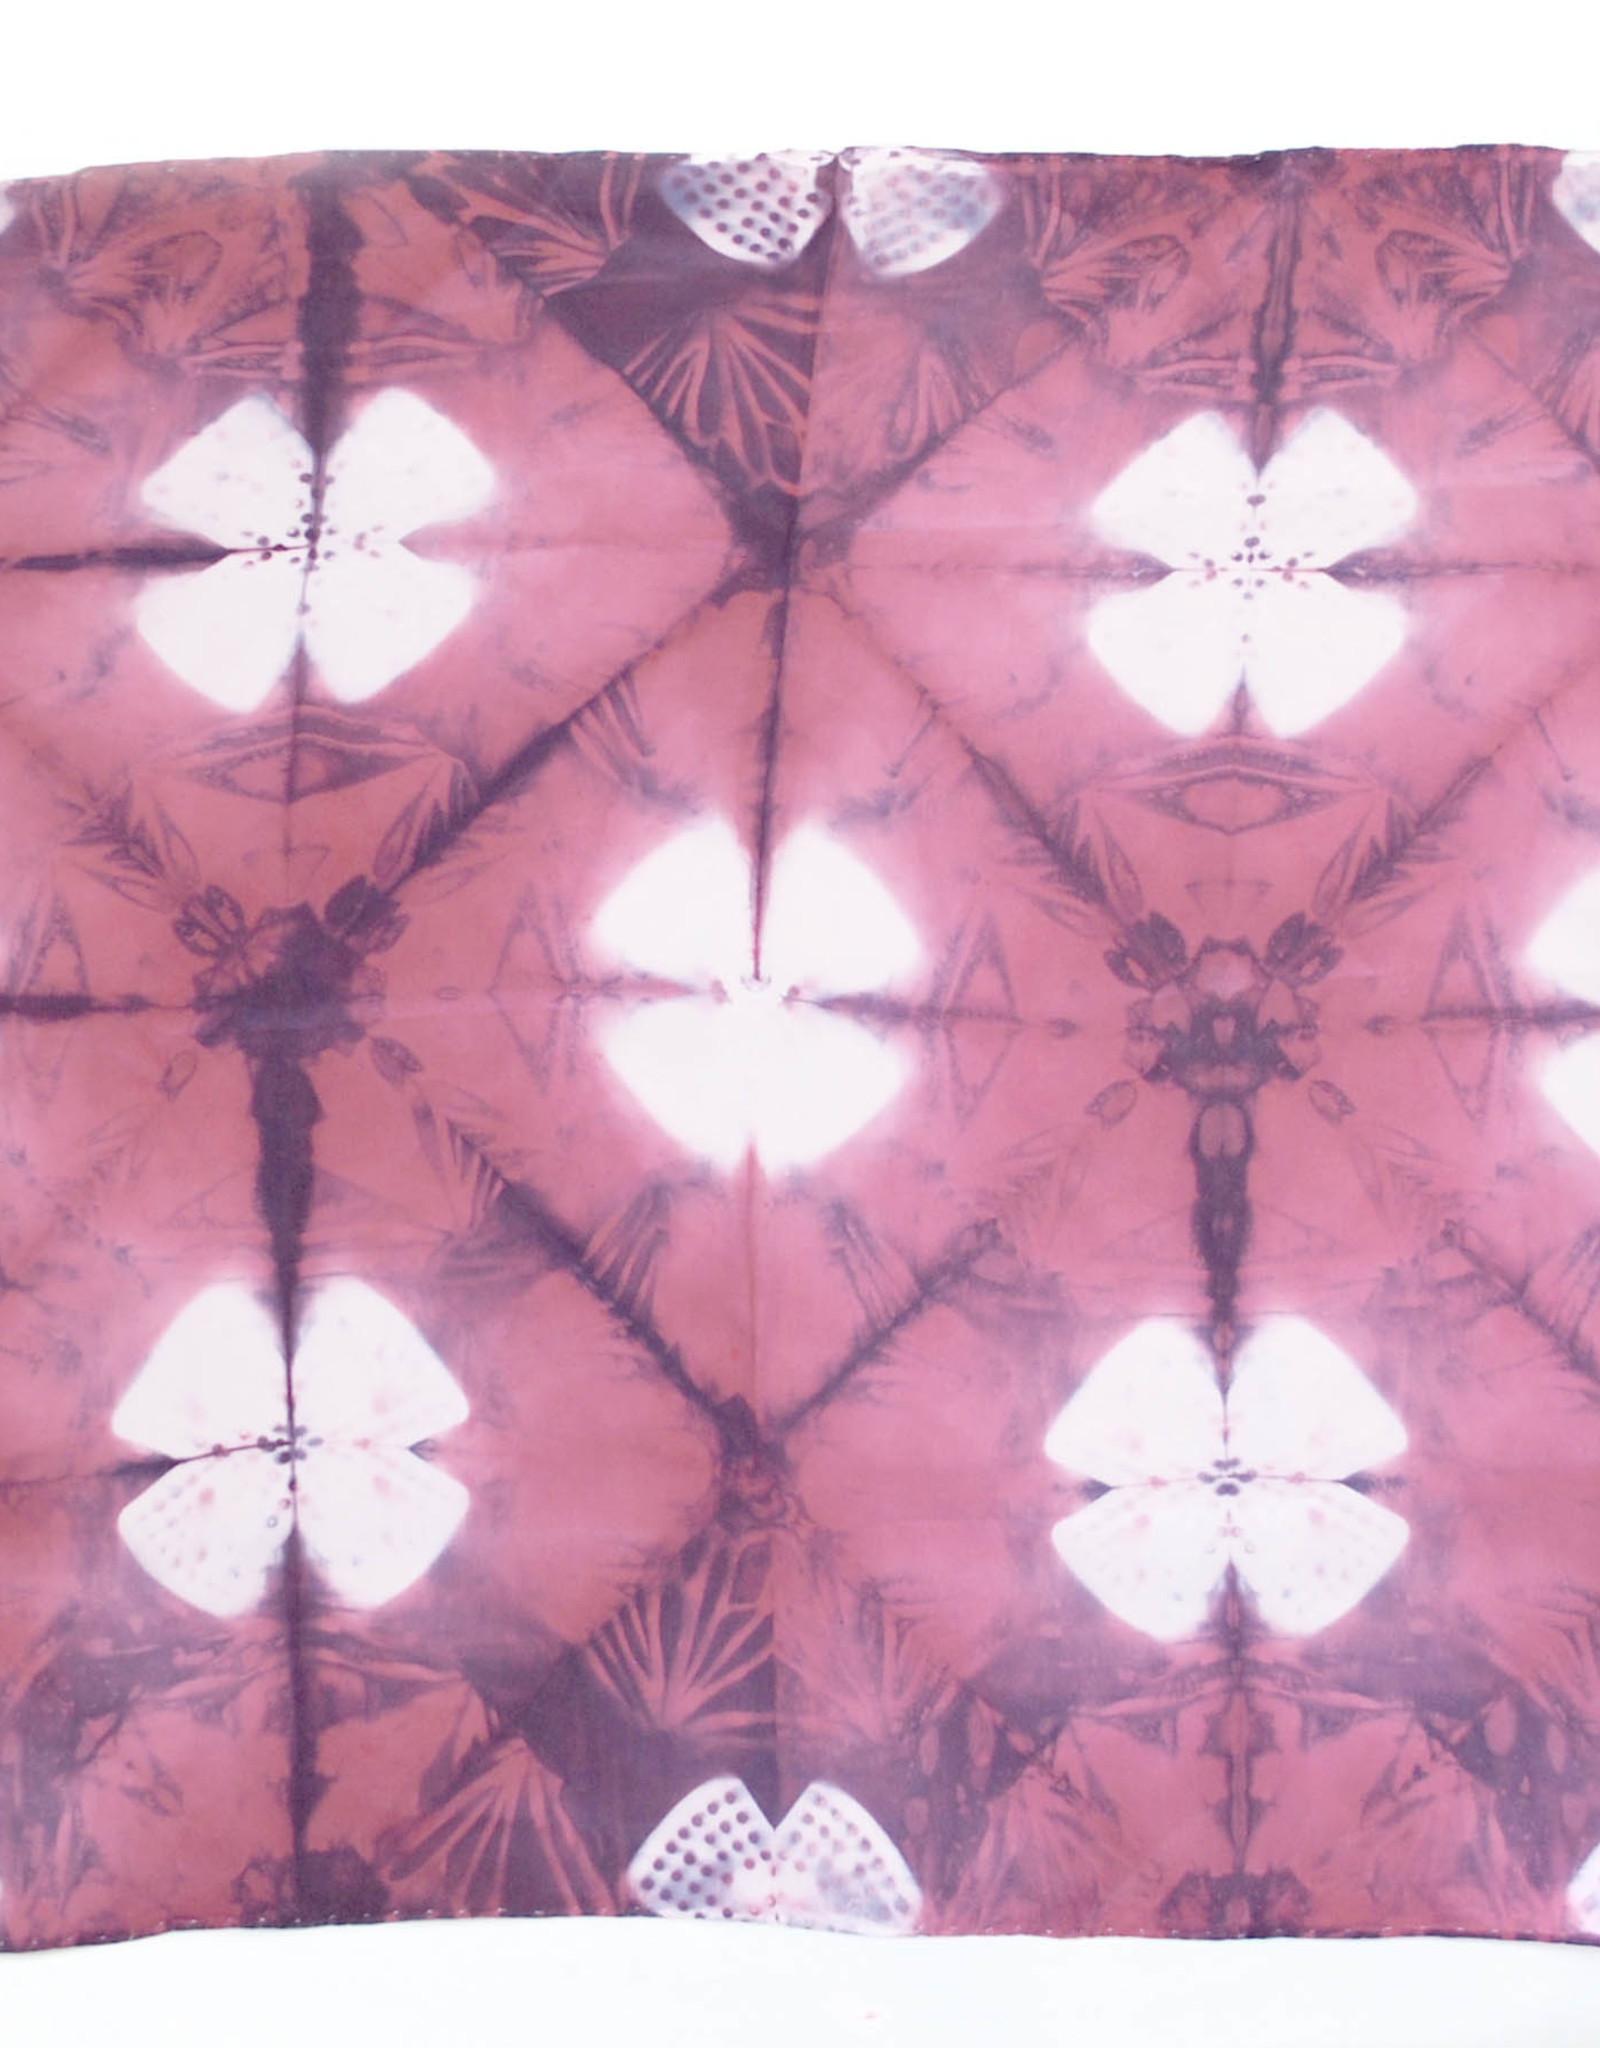 Crepe Squares by Anez, Zena Salam